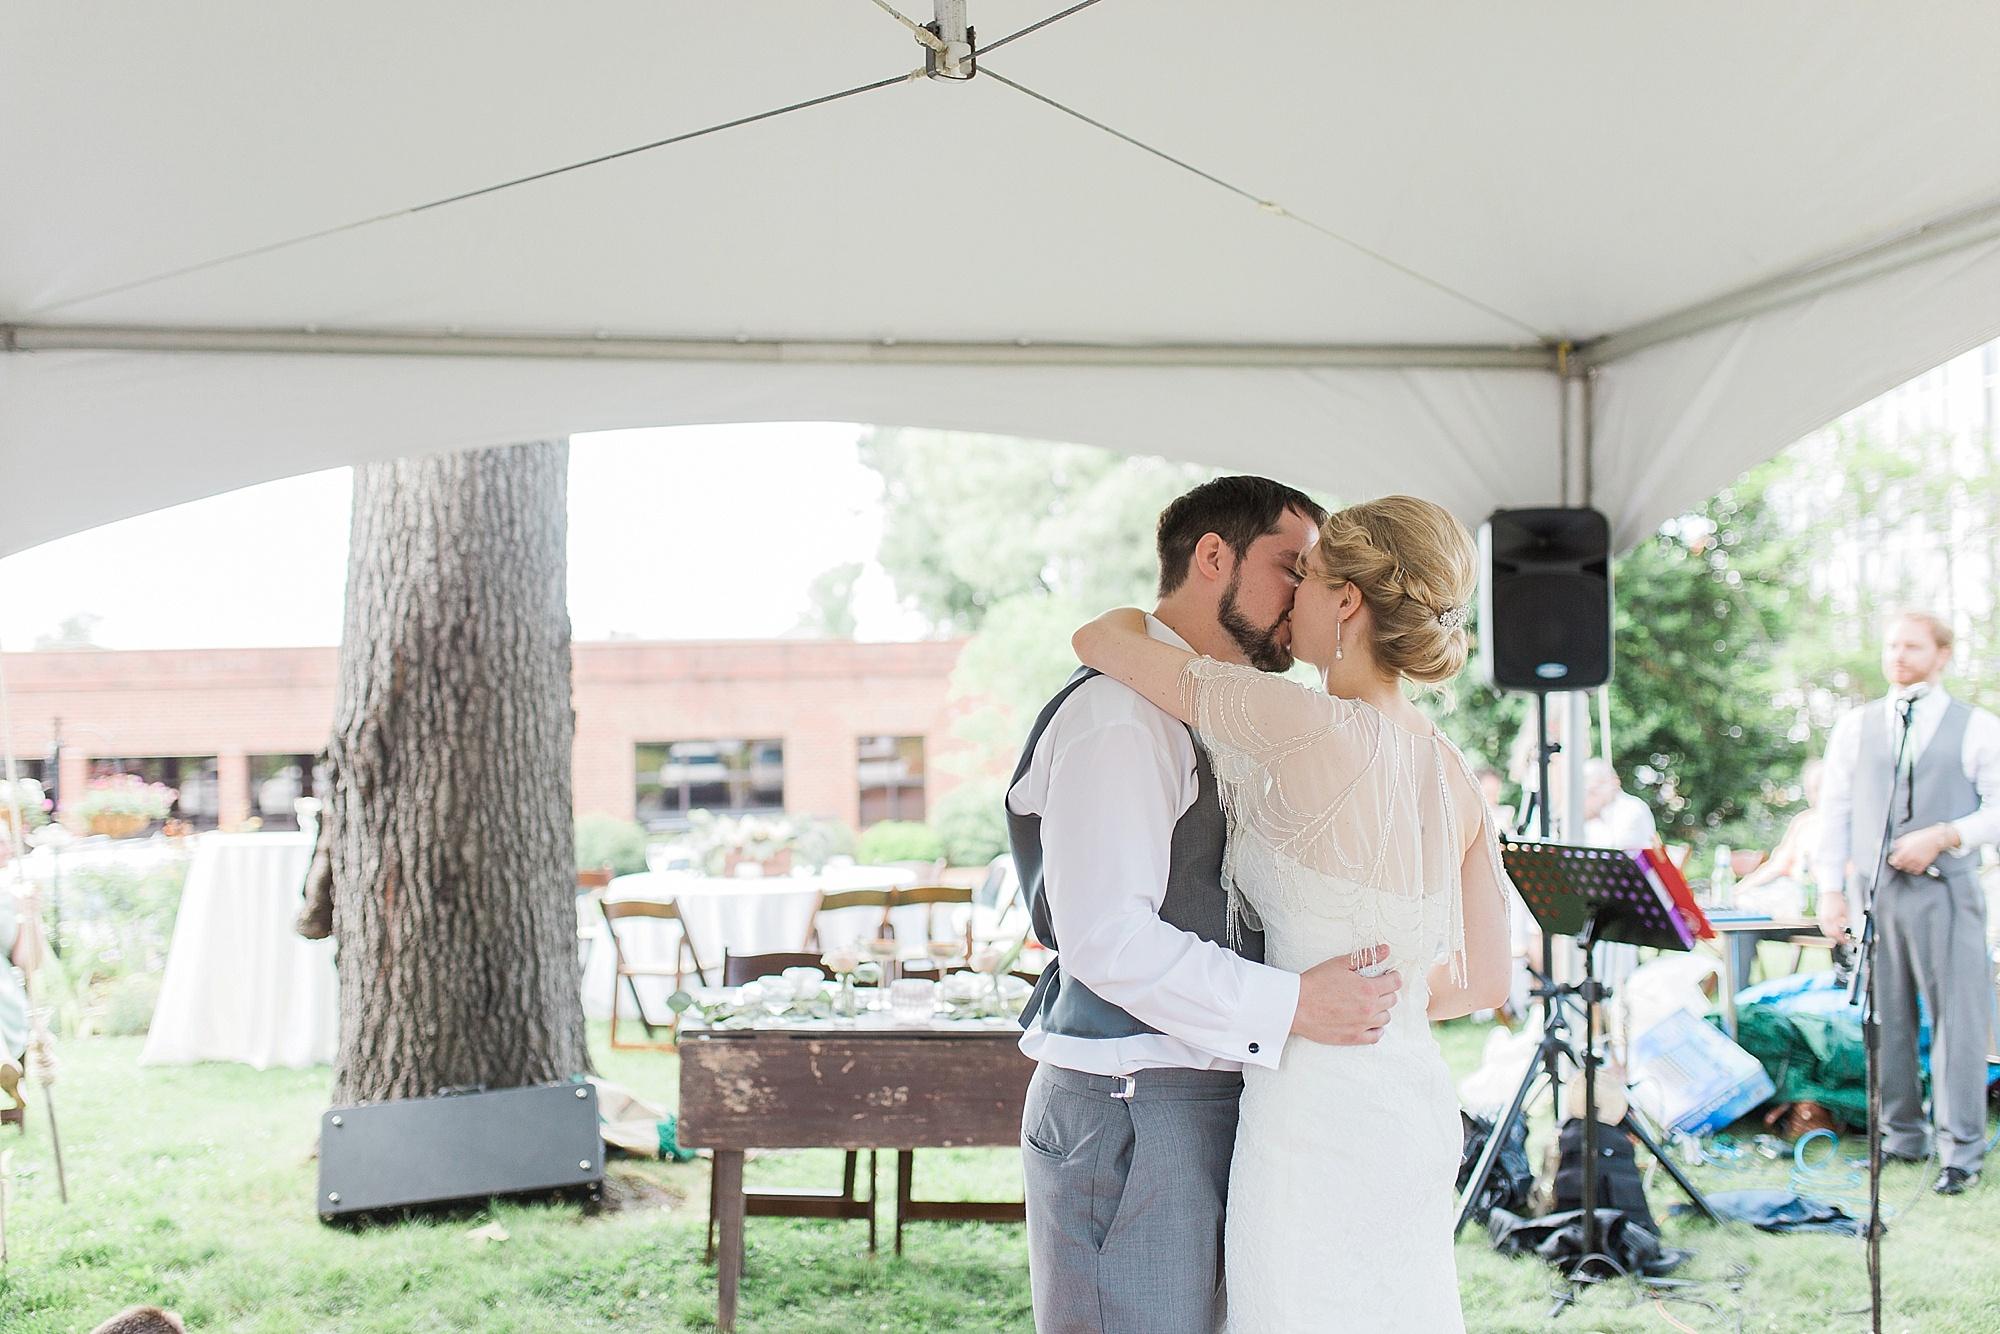 Wedding Photographer in Greensboro NC